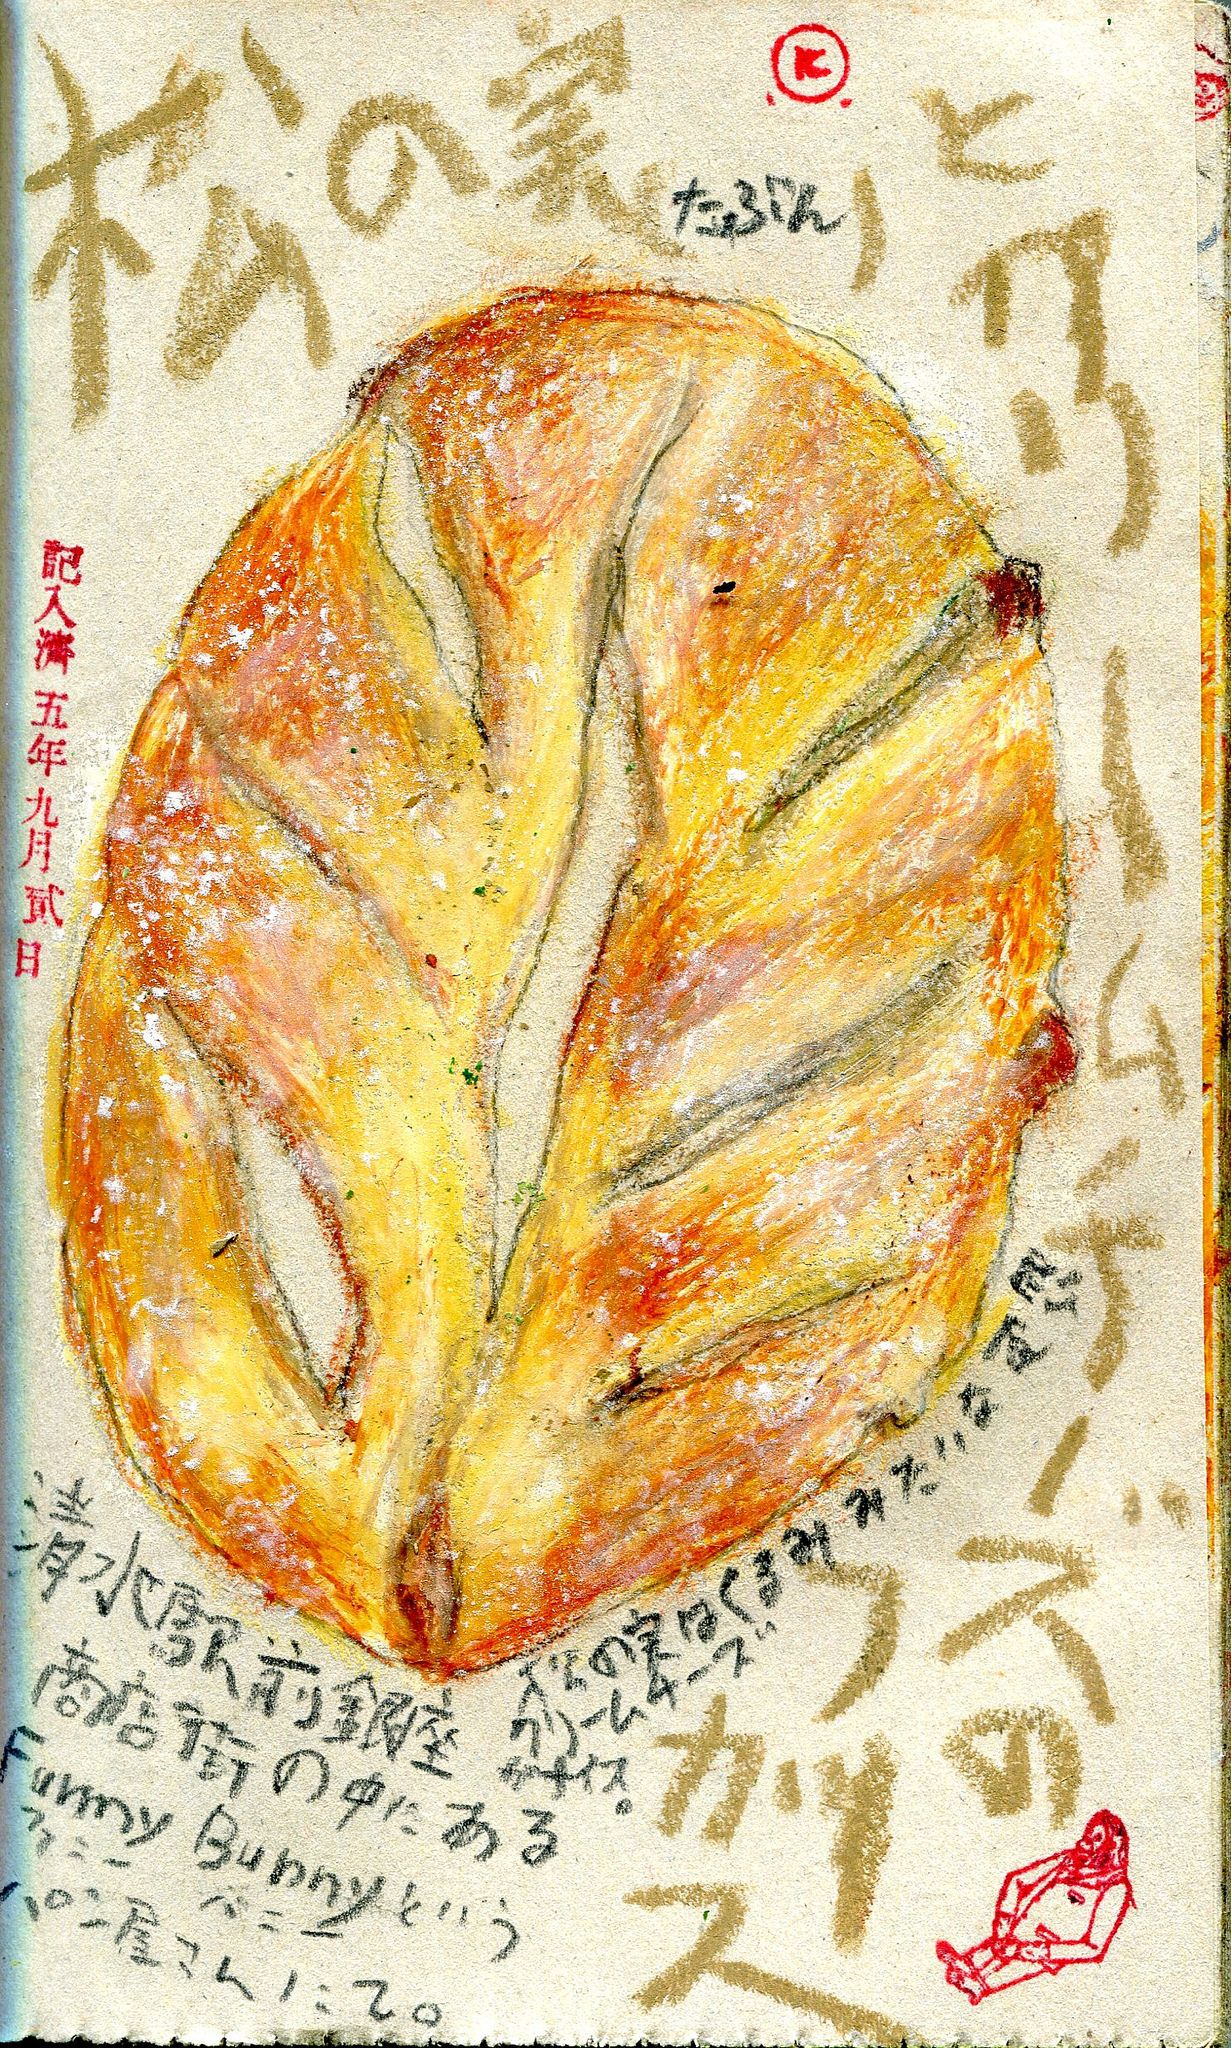 https://flic.kr/p/xbsanw   フーガス   清水駅前銀座商店街アーケード内にて Japan/Shizuoka